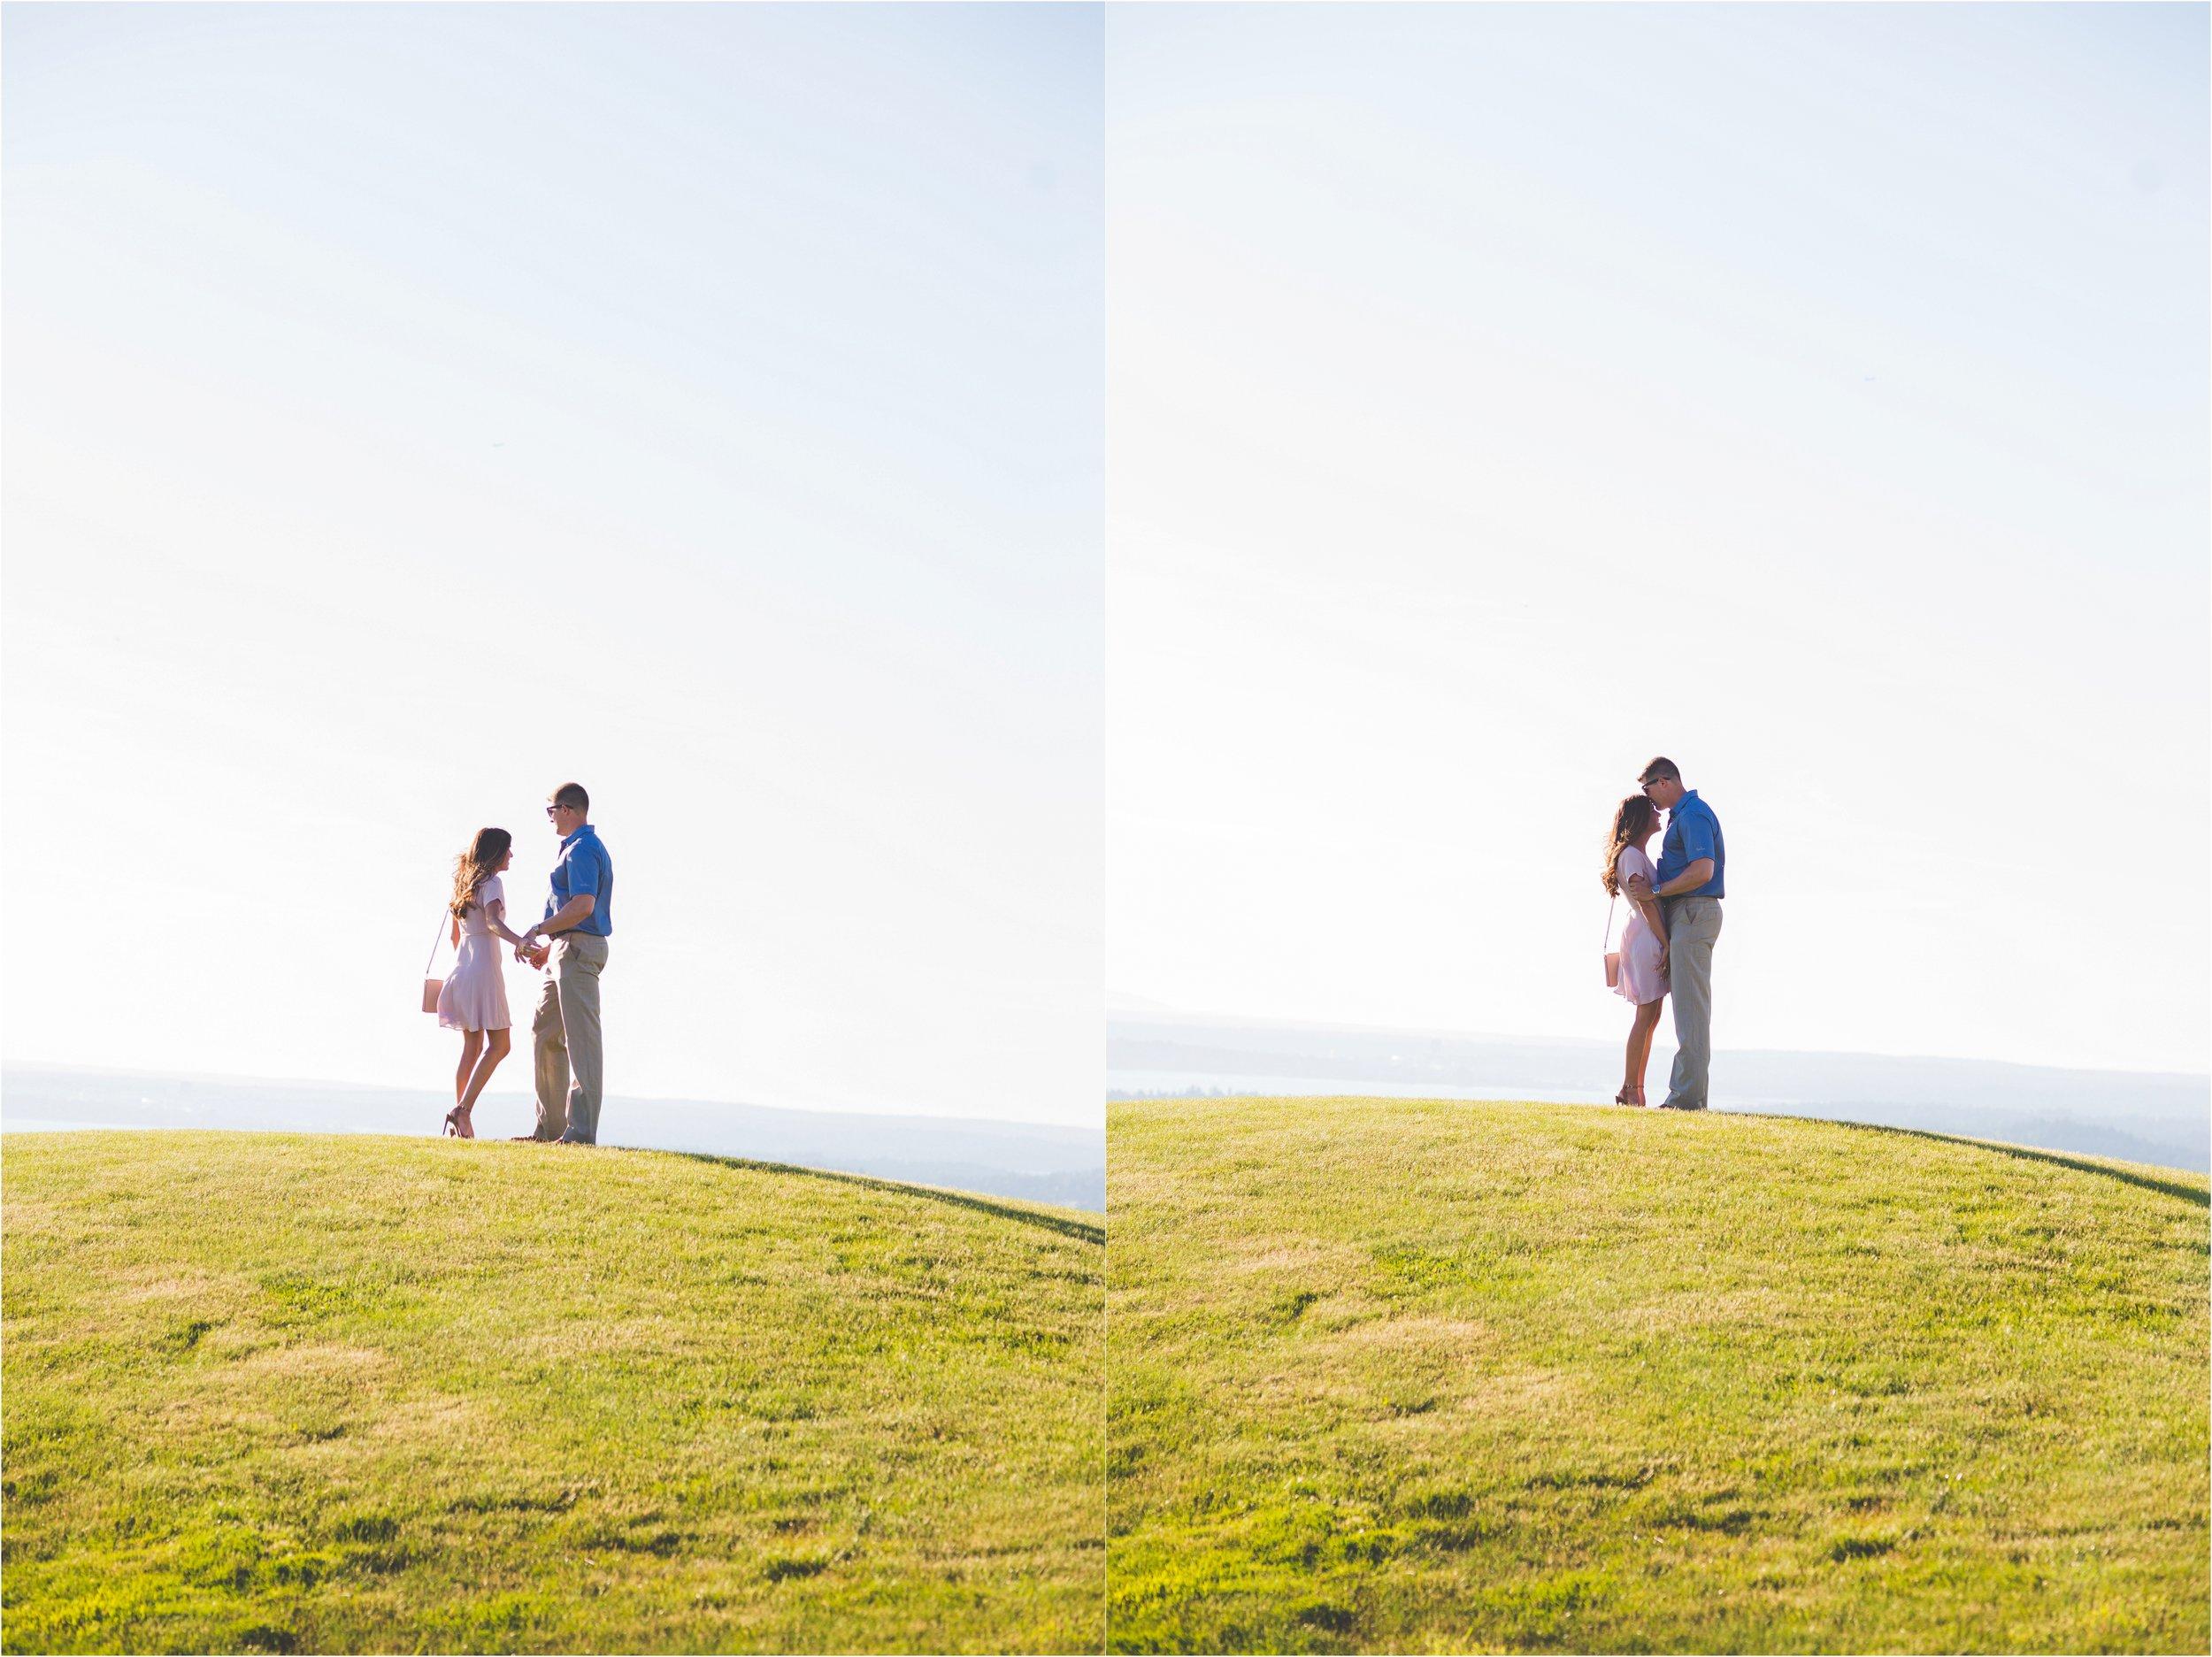 newcastle-golf-club-proposal-jannicka-mayte-seattle-washington-engagement-wedding-photographer_0002.jpg